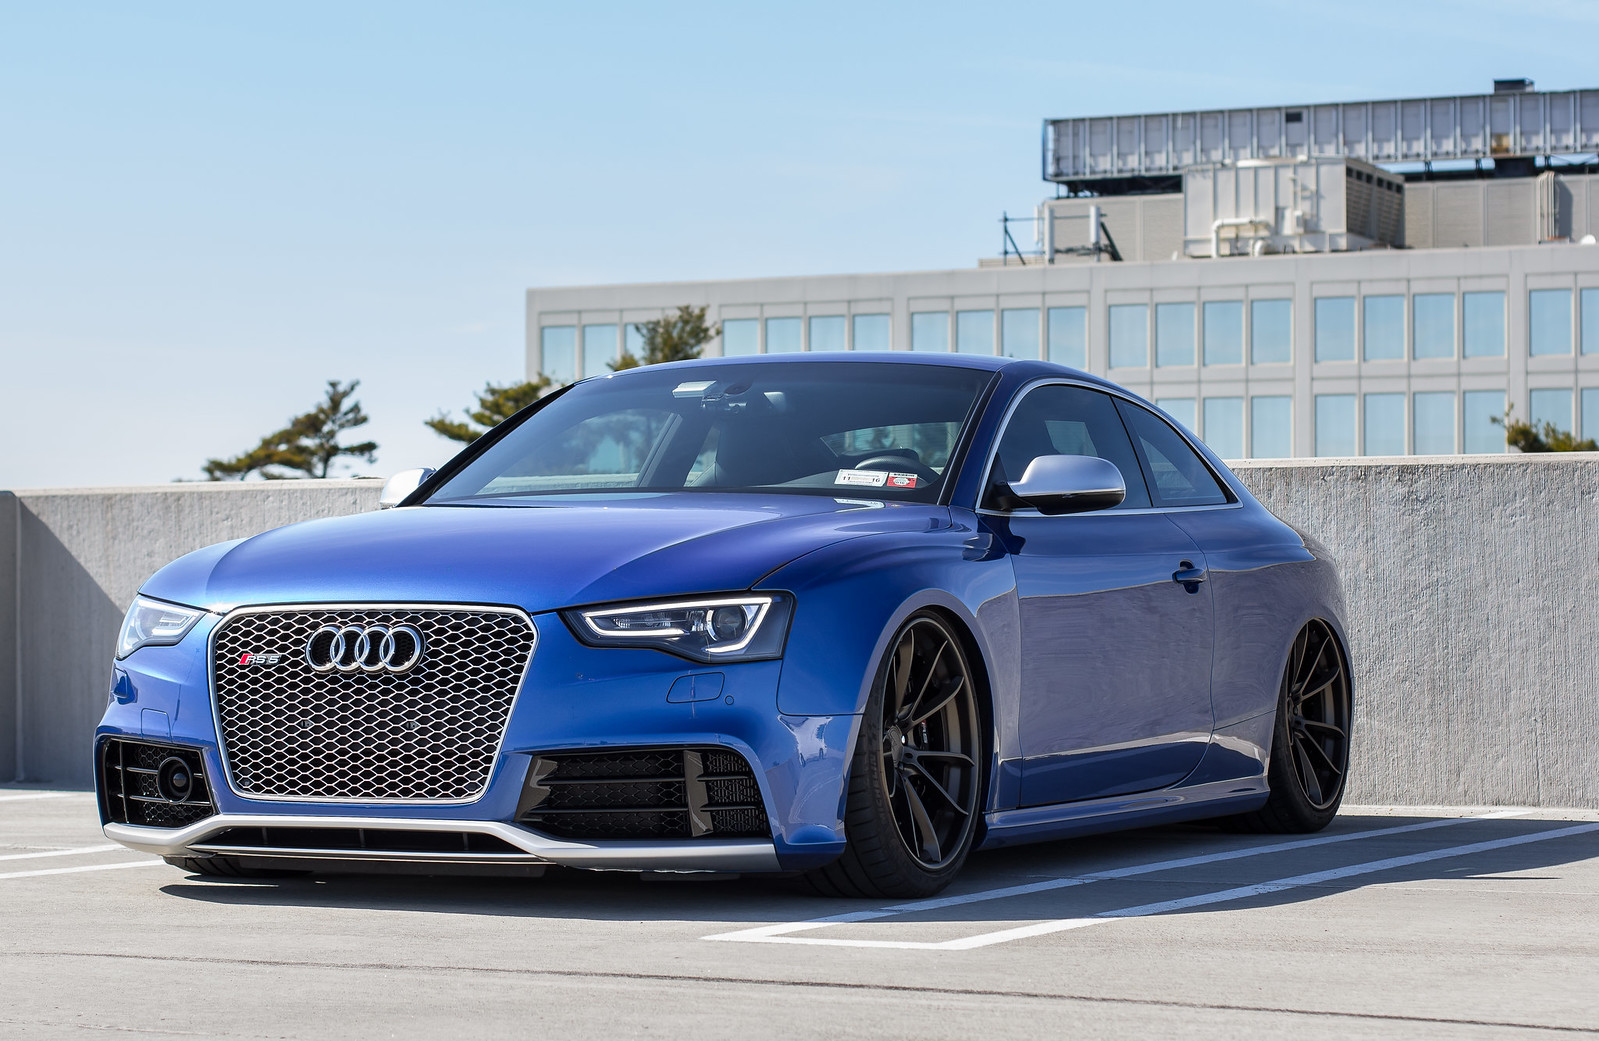 Audi rs5 2015 blue 19